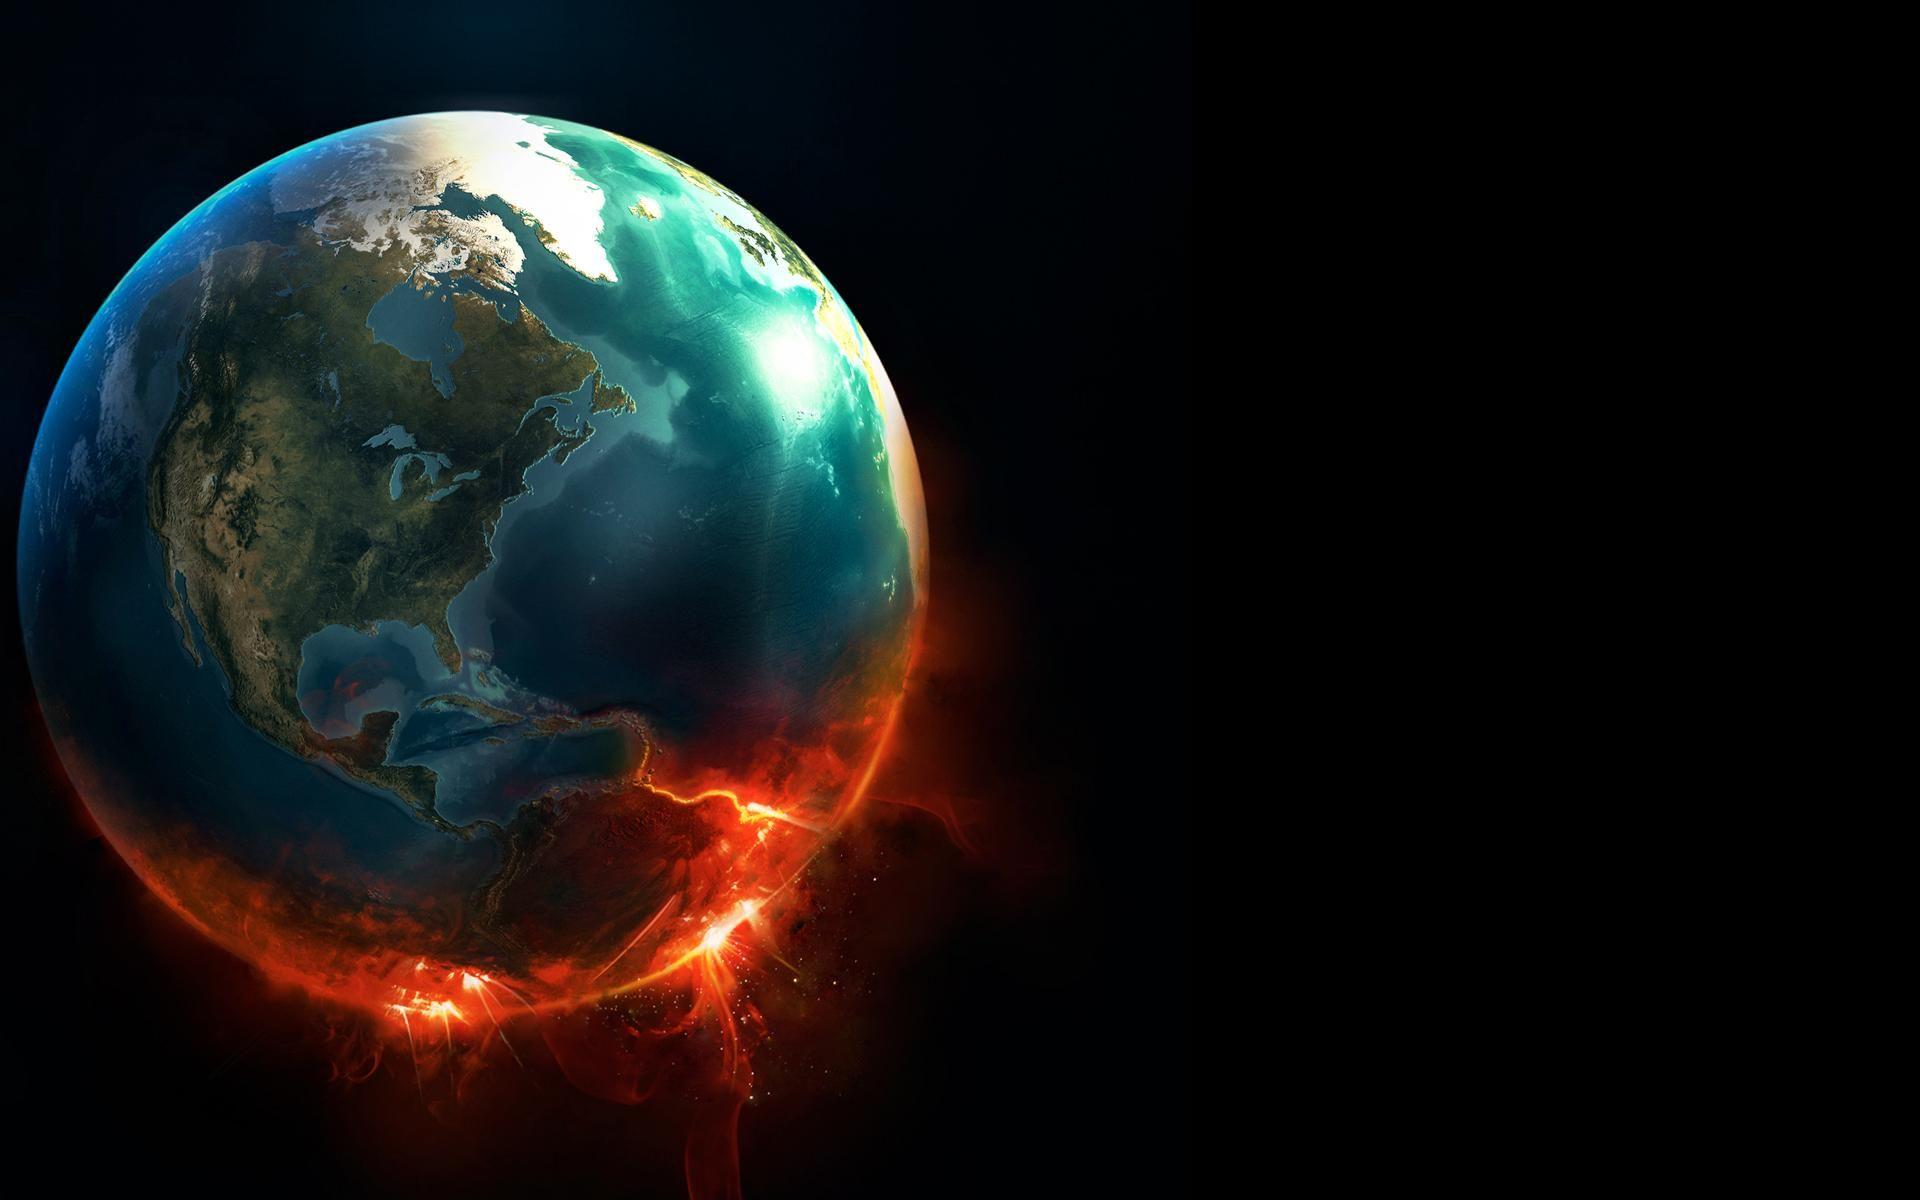 Earth Animated Wallpaper Download Фильмы, Фильмы онлайн